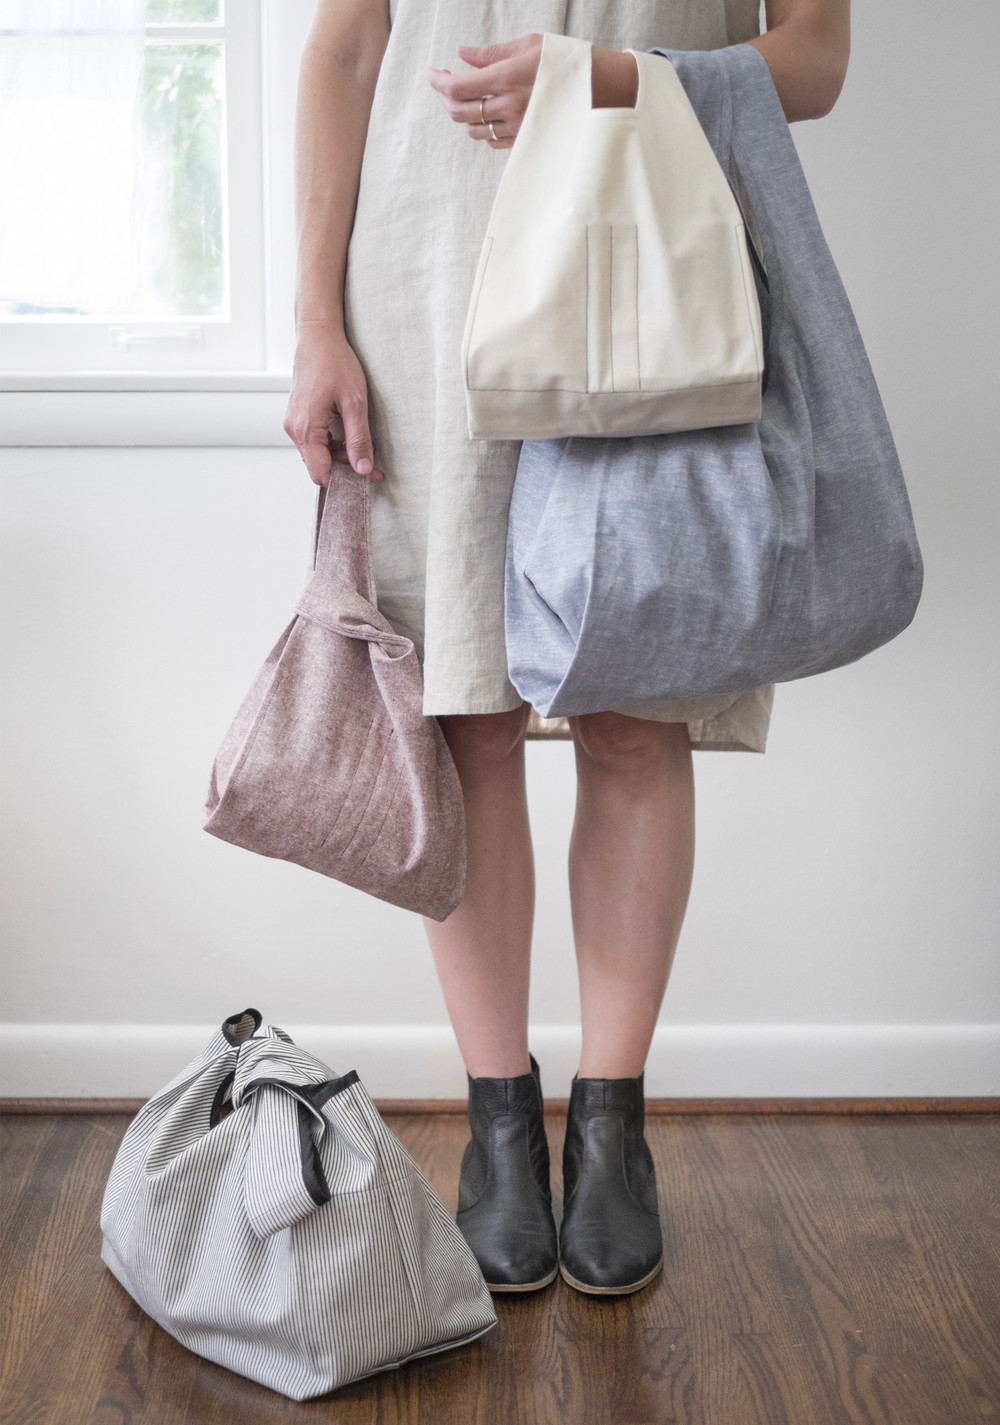 Stowe Bag from Grainline Studio